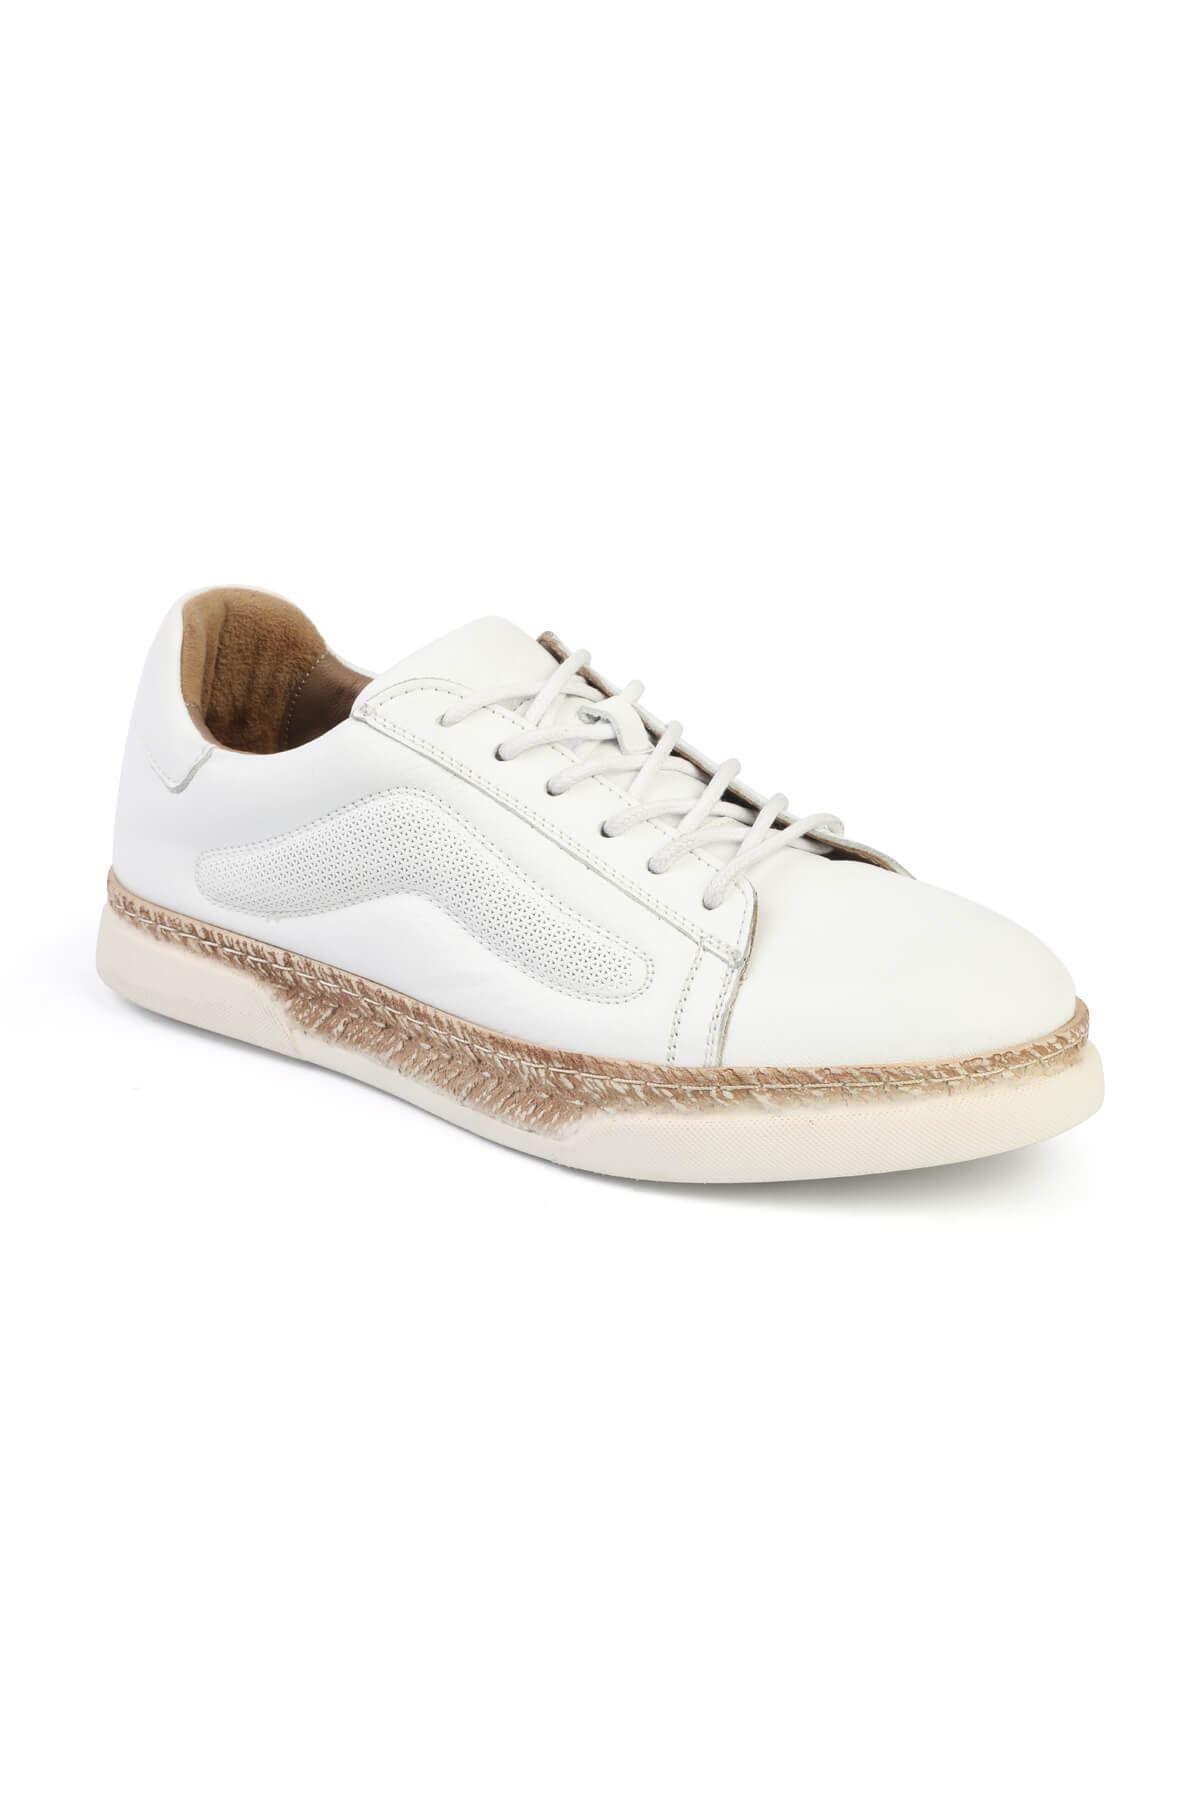 Libero 3023 Beyaz Casual Ayakkabı